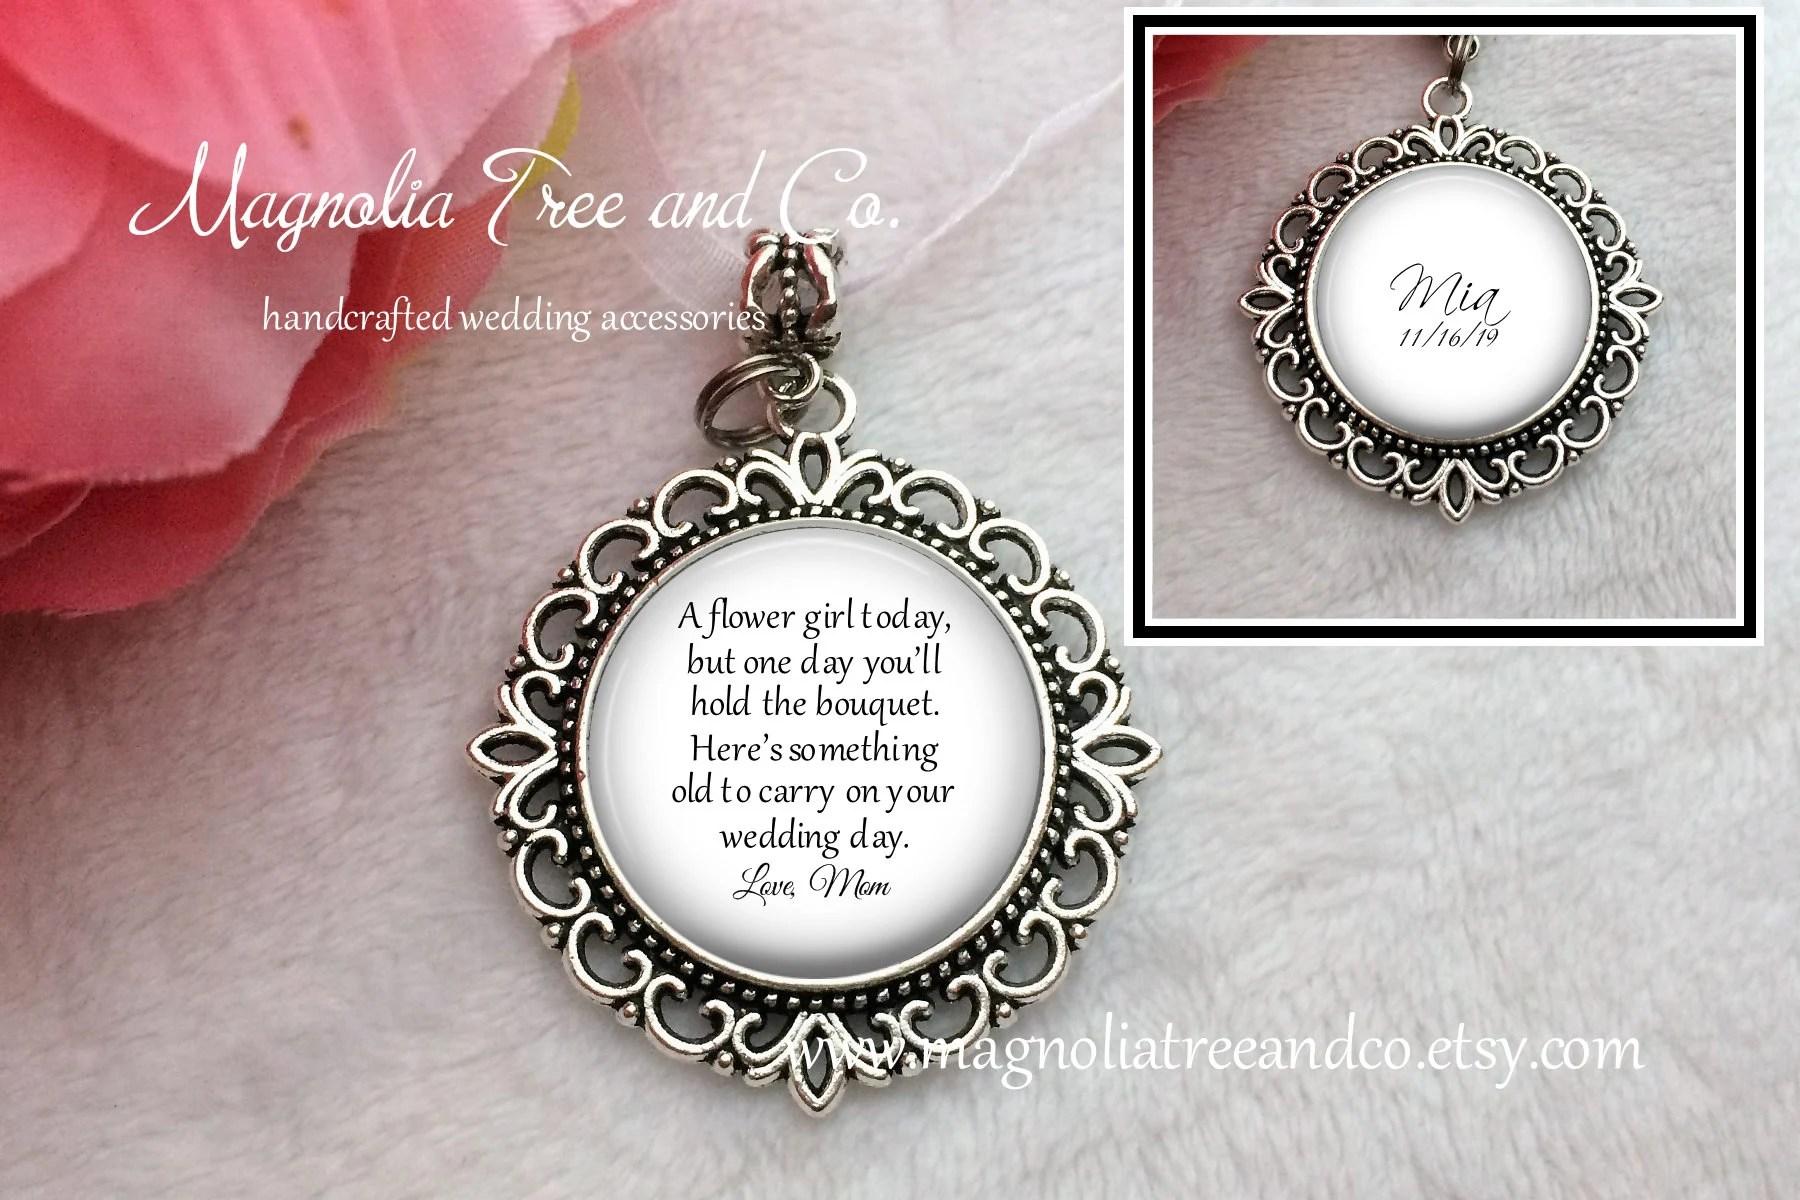 Flower Girl or Bridesmaid Charm Pendant Flowergirl Gift image 1